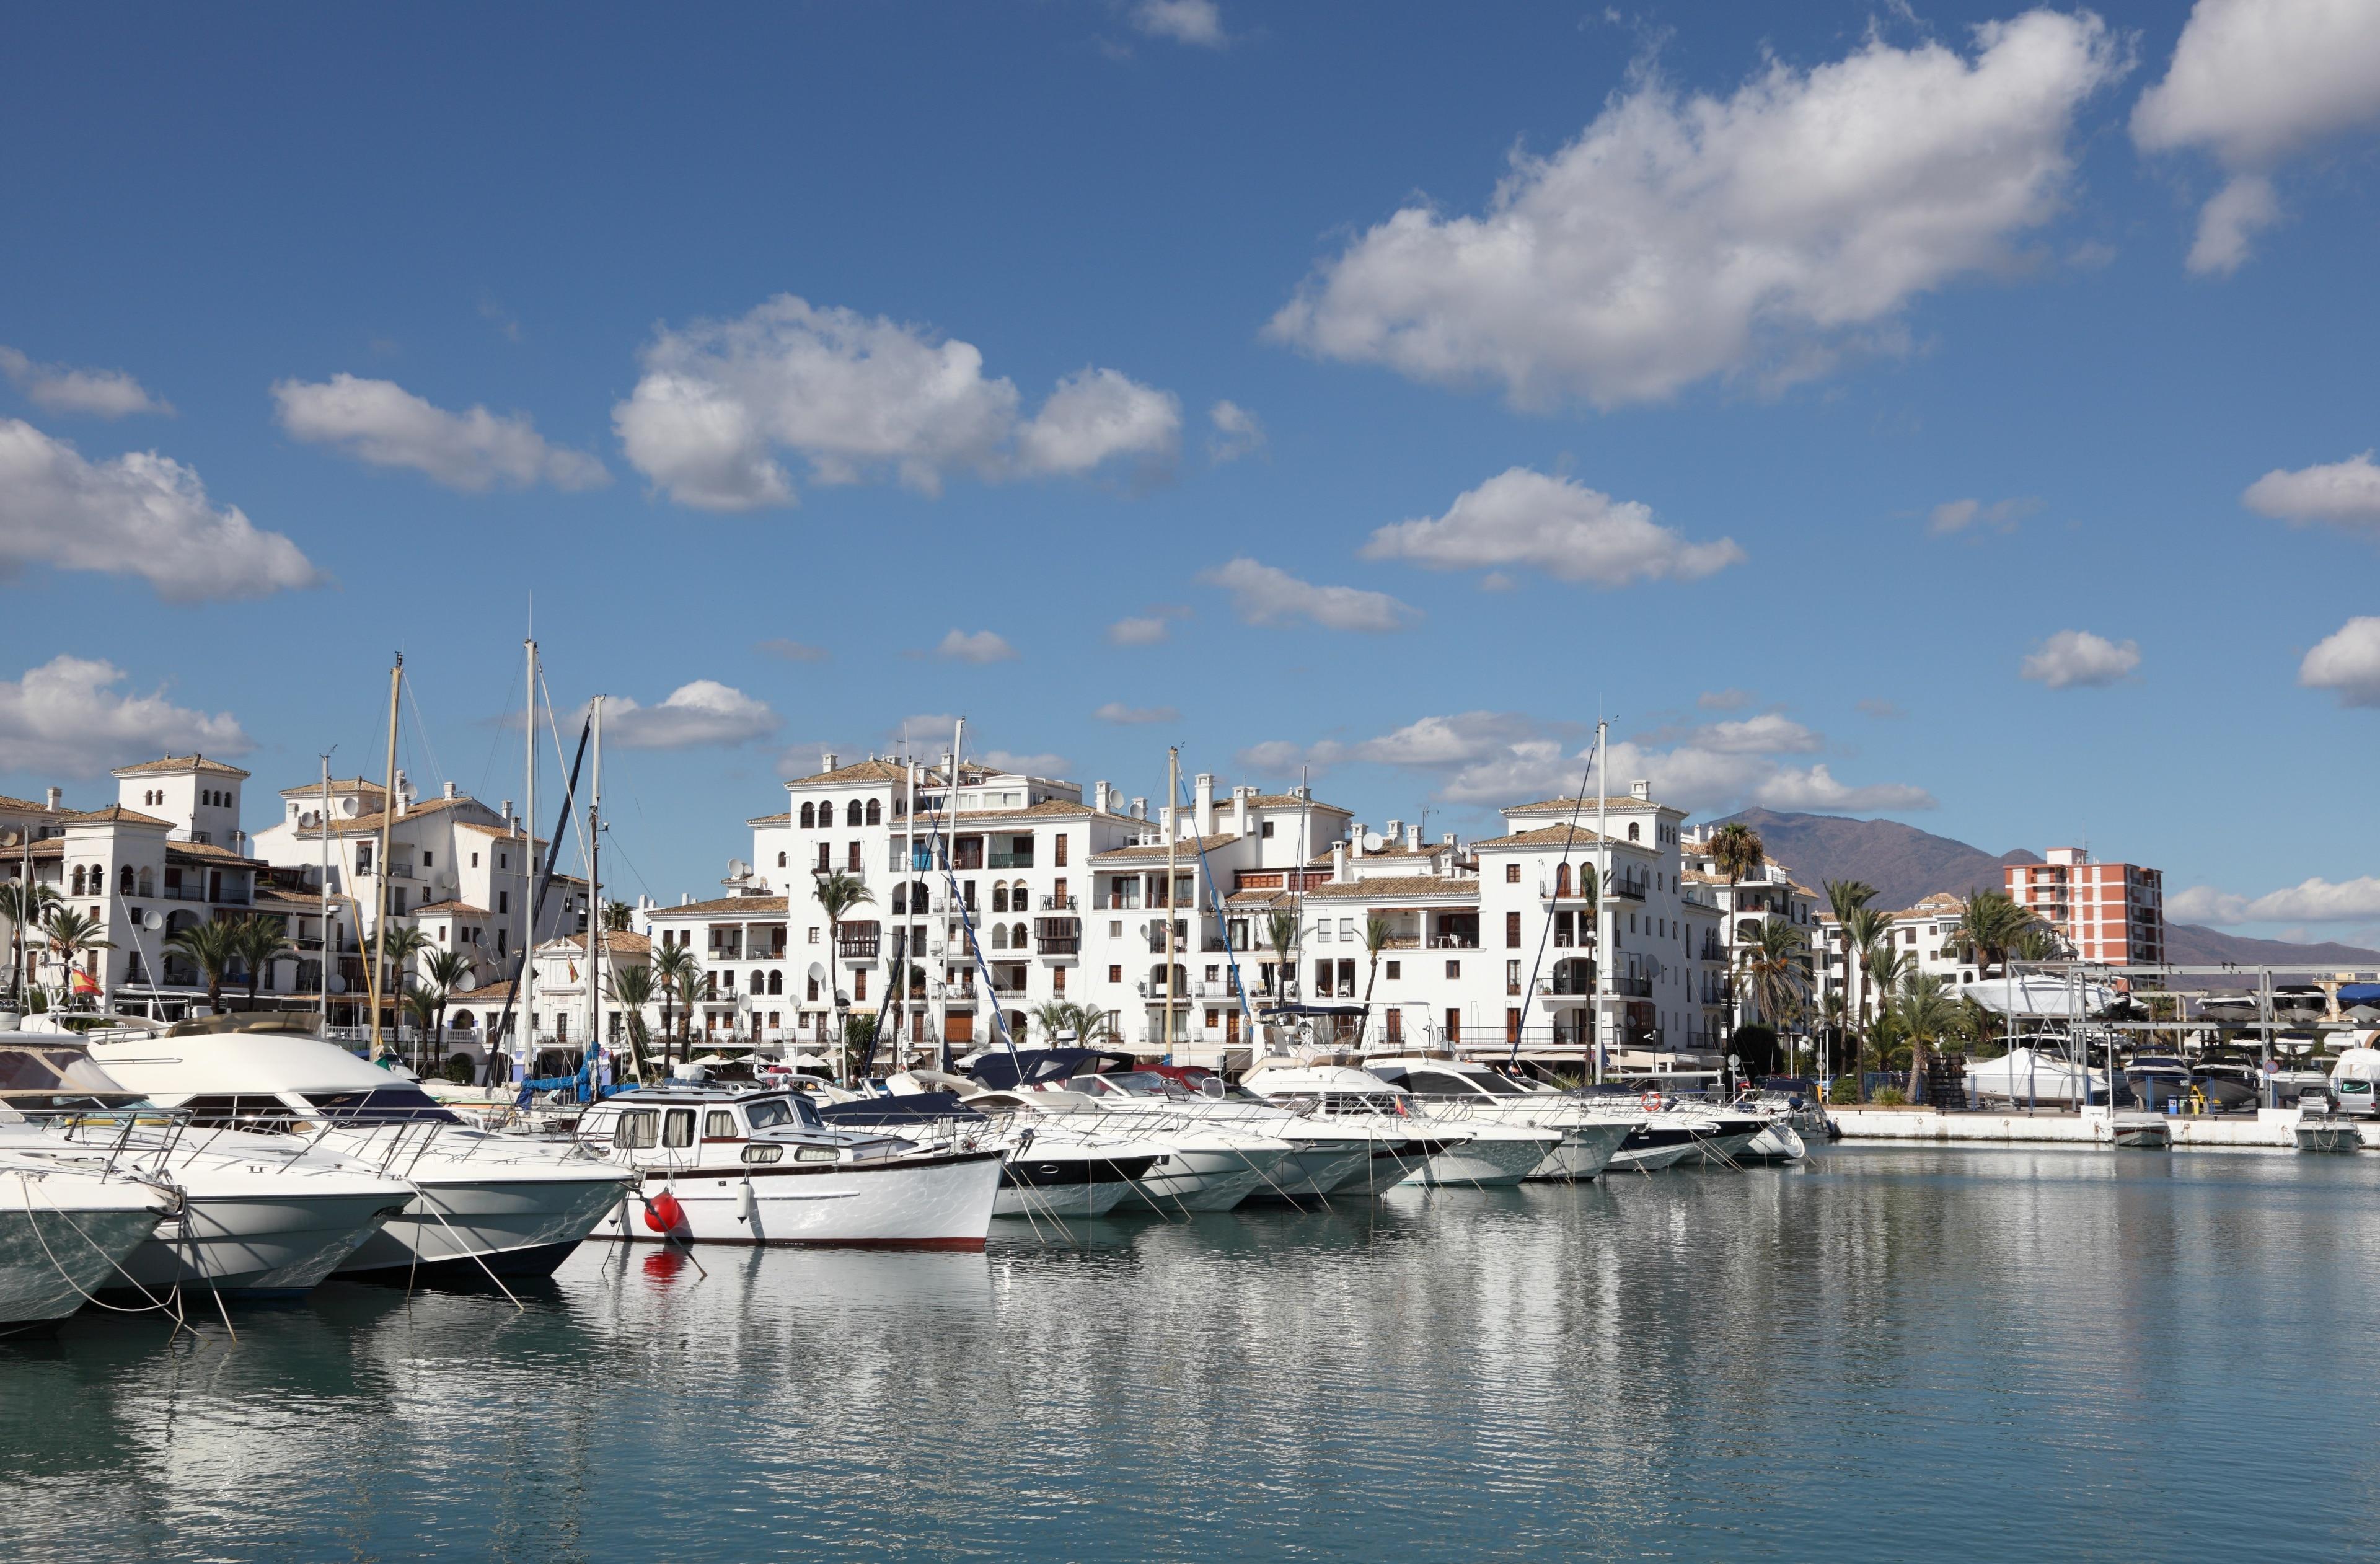 Puerto de la Duquesa, Manilva, Andalusia, Spain